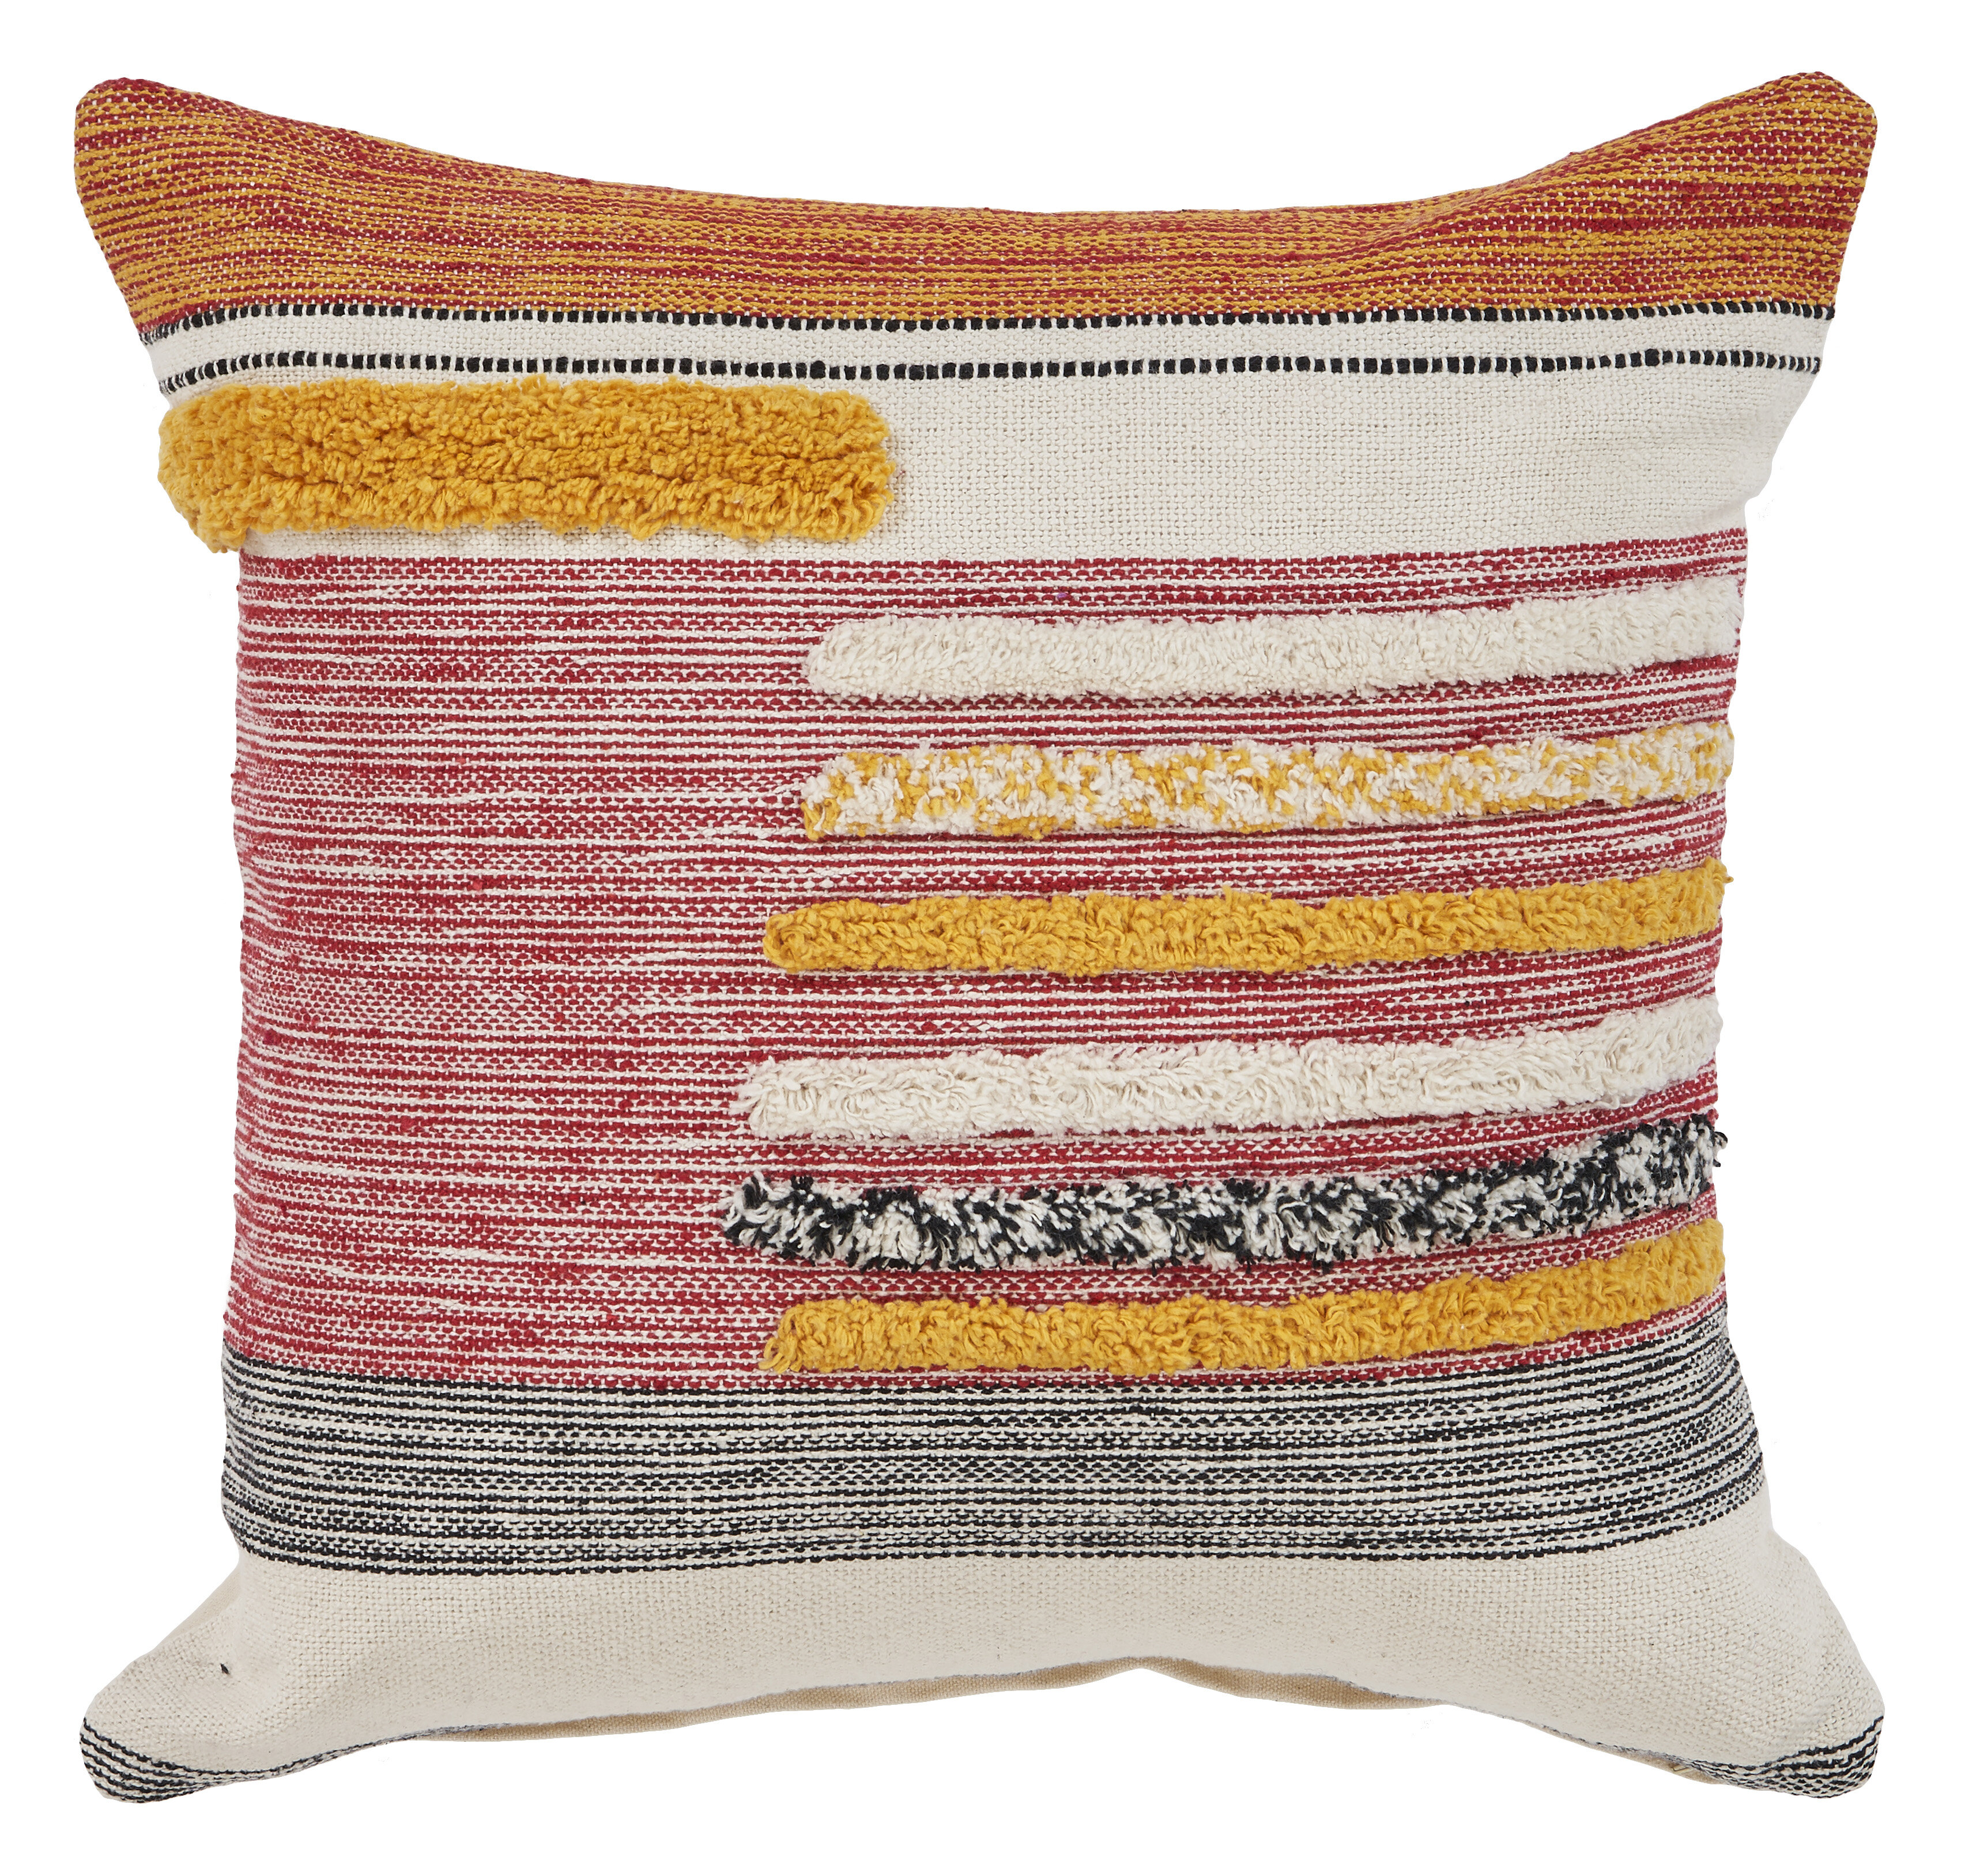 Adler Cotton Throw Pillow Cover Insert Reviews Allmodern